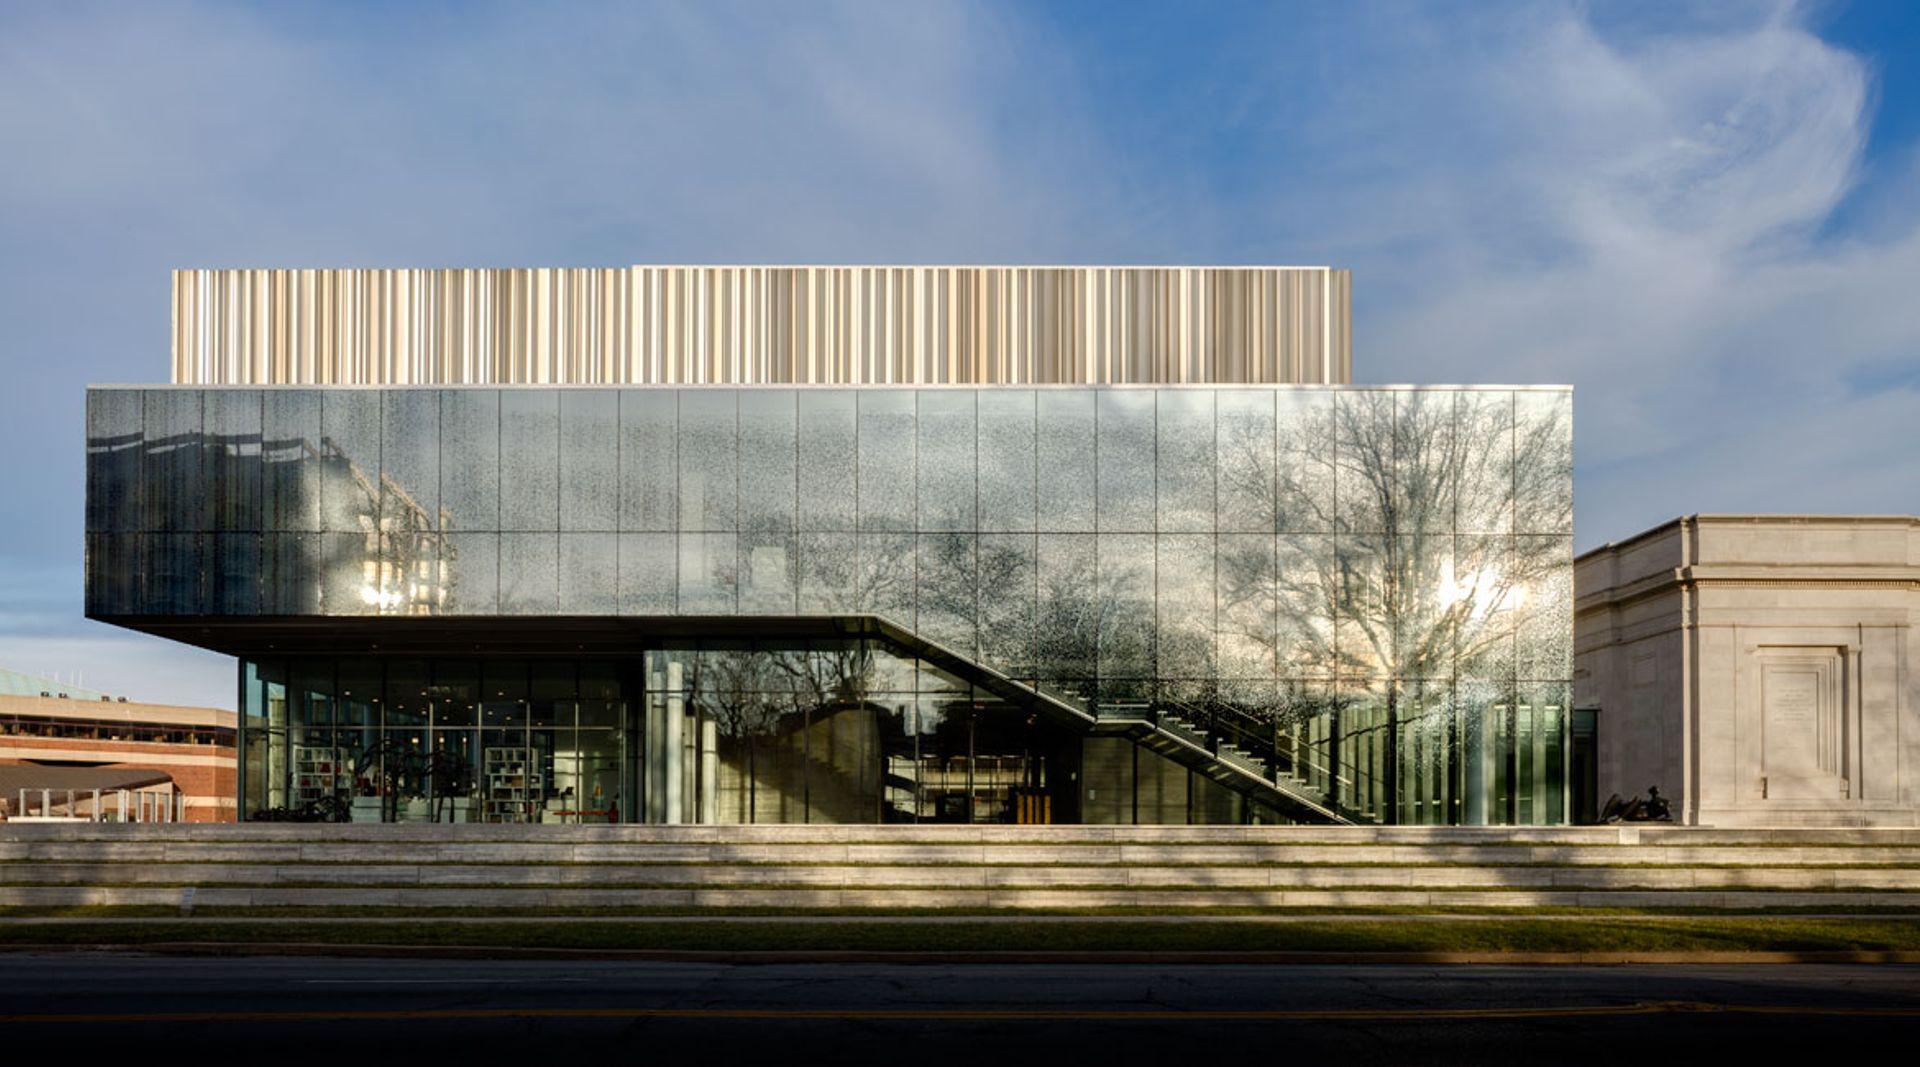 The Speed Art Museum in Louisville, Kentucky